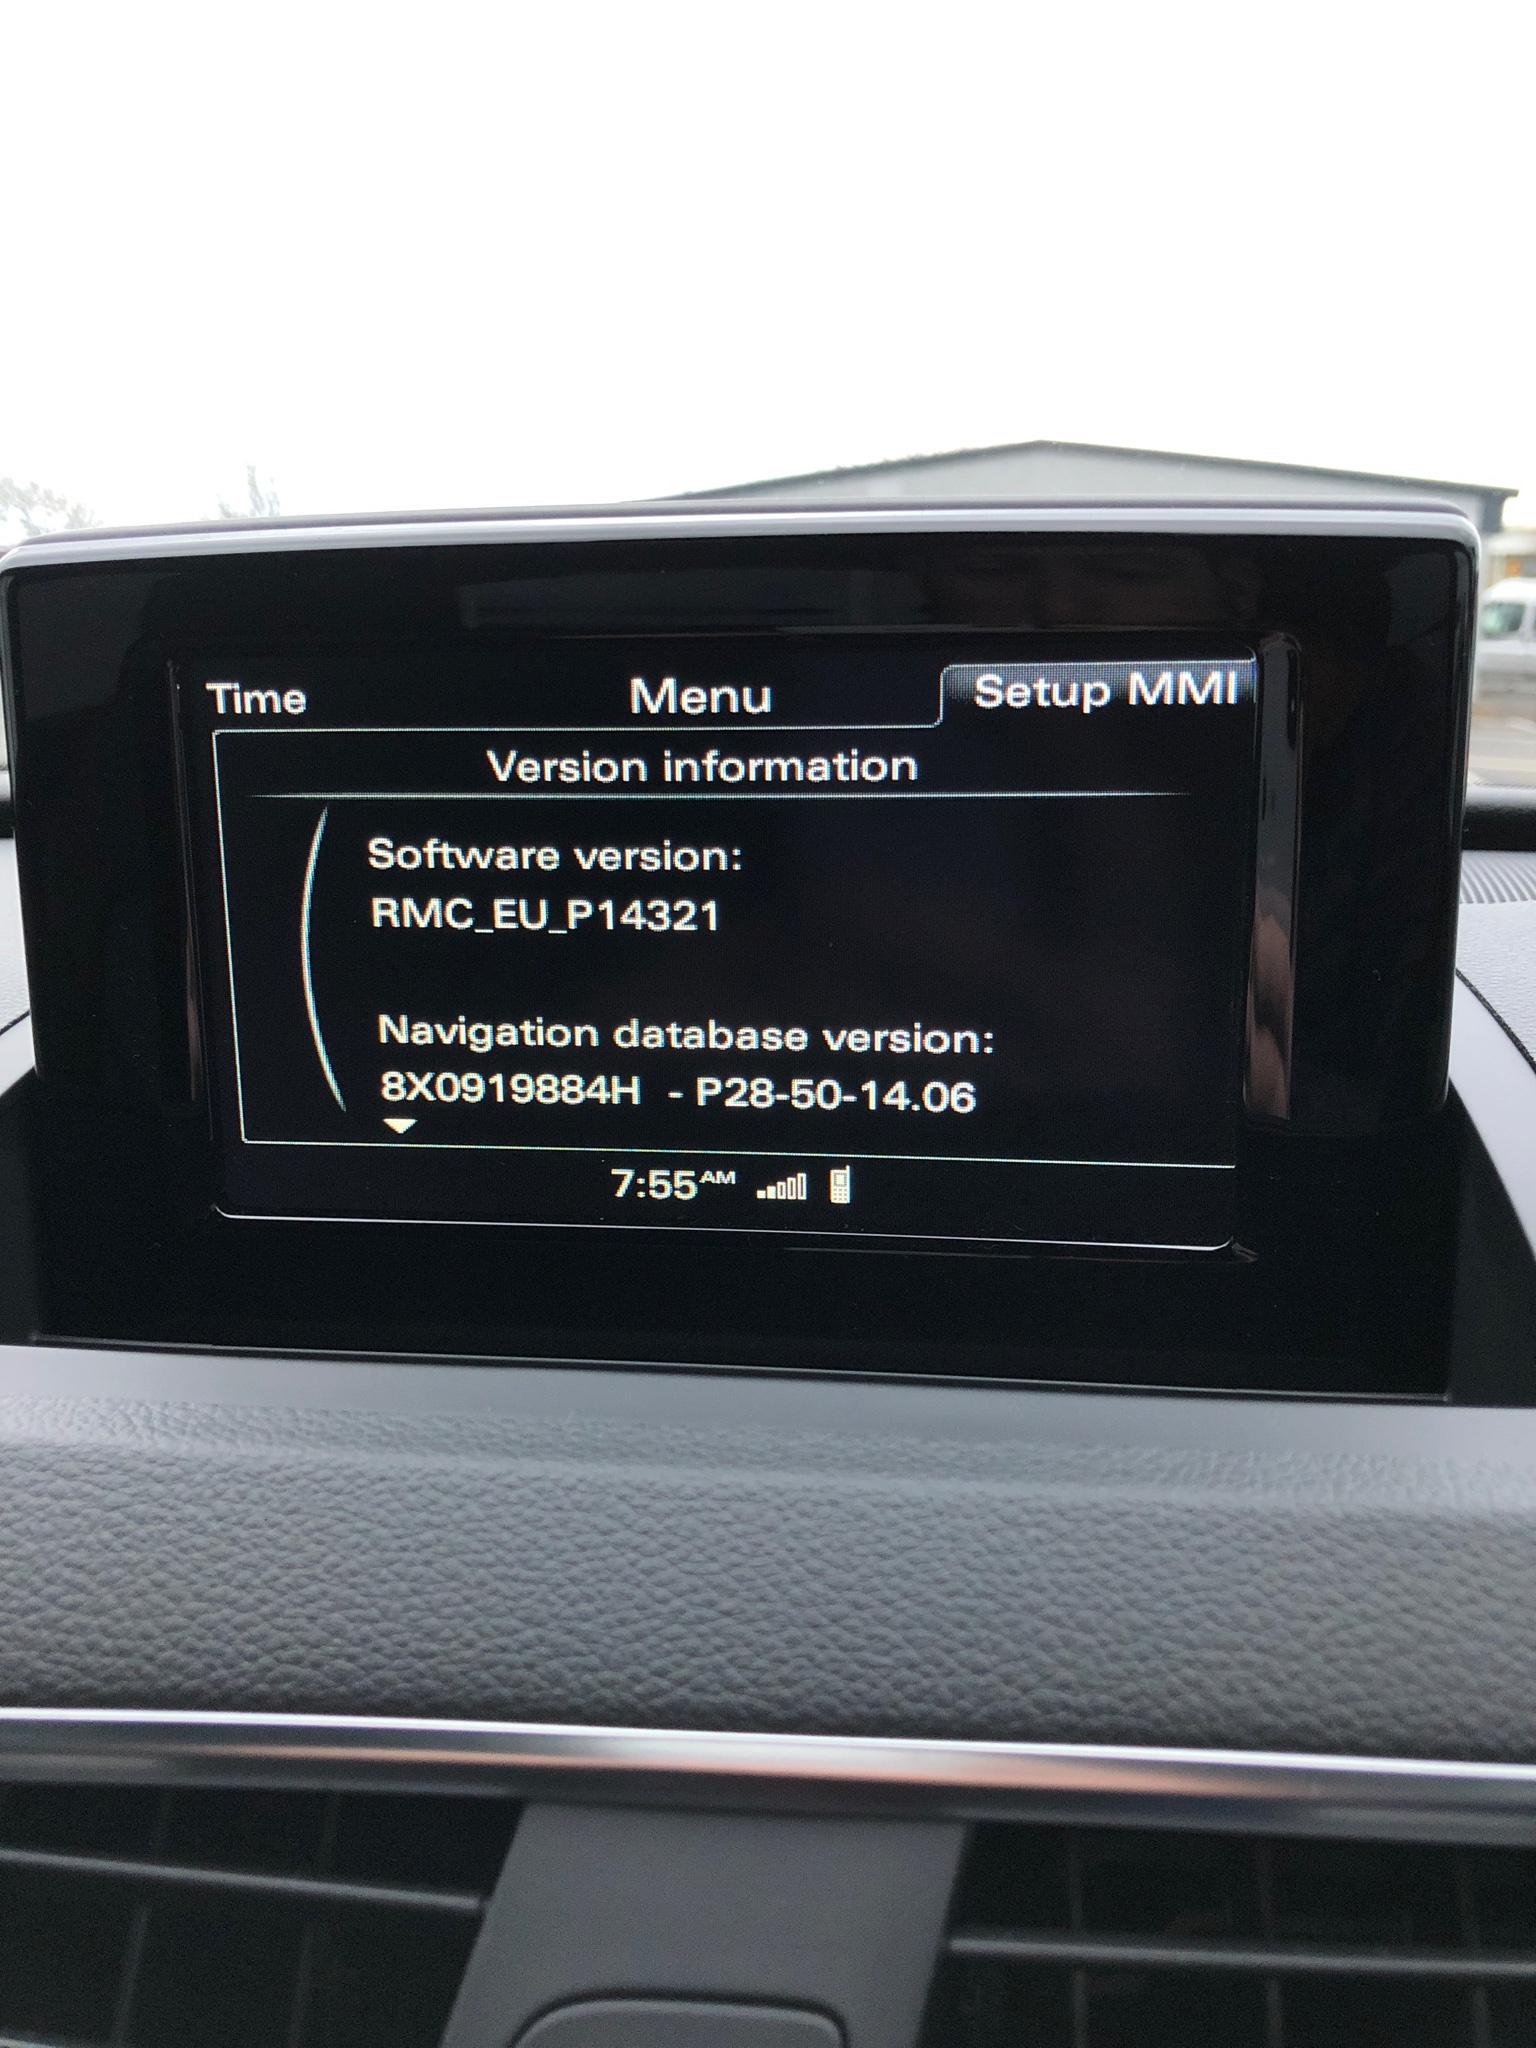 MMI and Console Reboots Randomly - Audi Q3 Forum